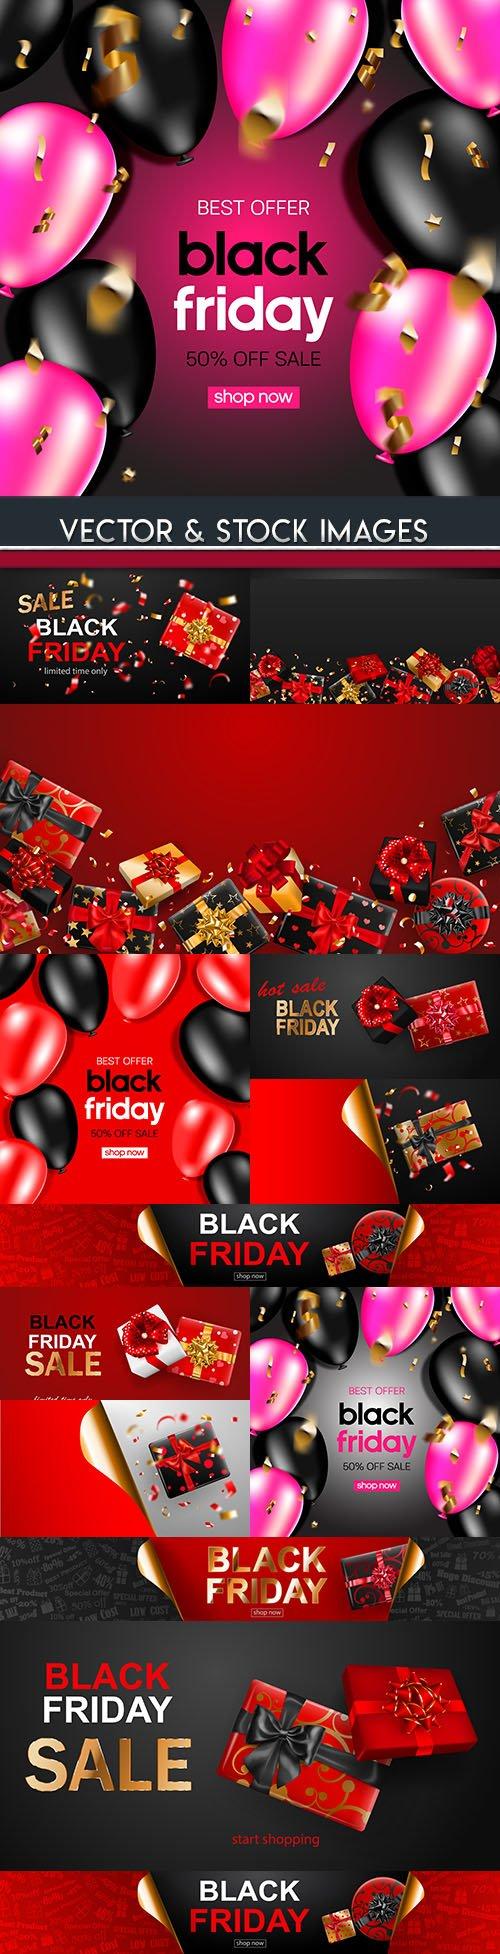 Black Friday and sale special design illustration 19